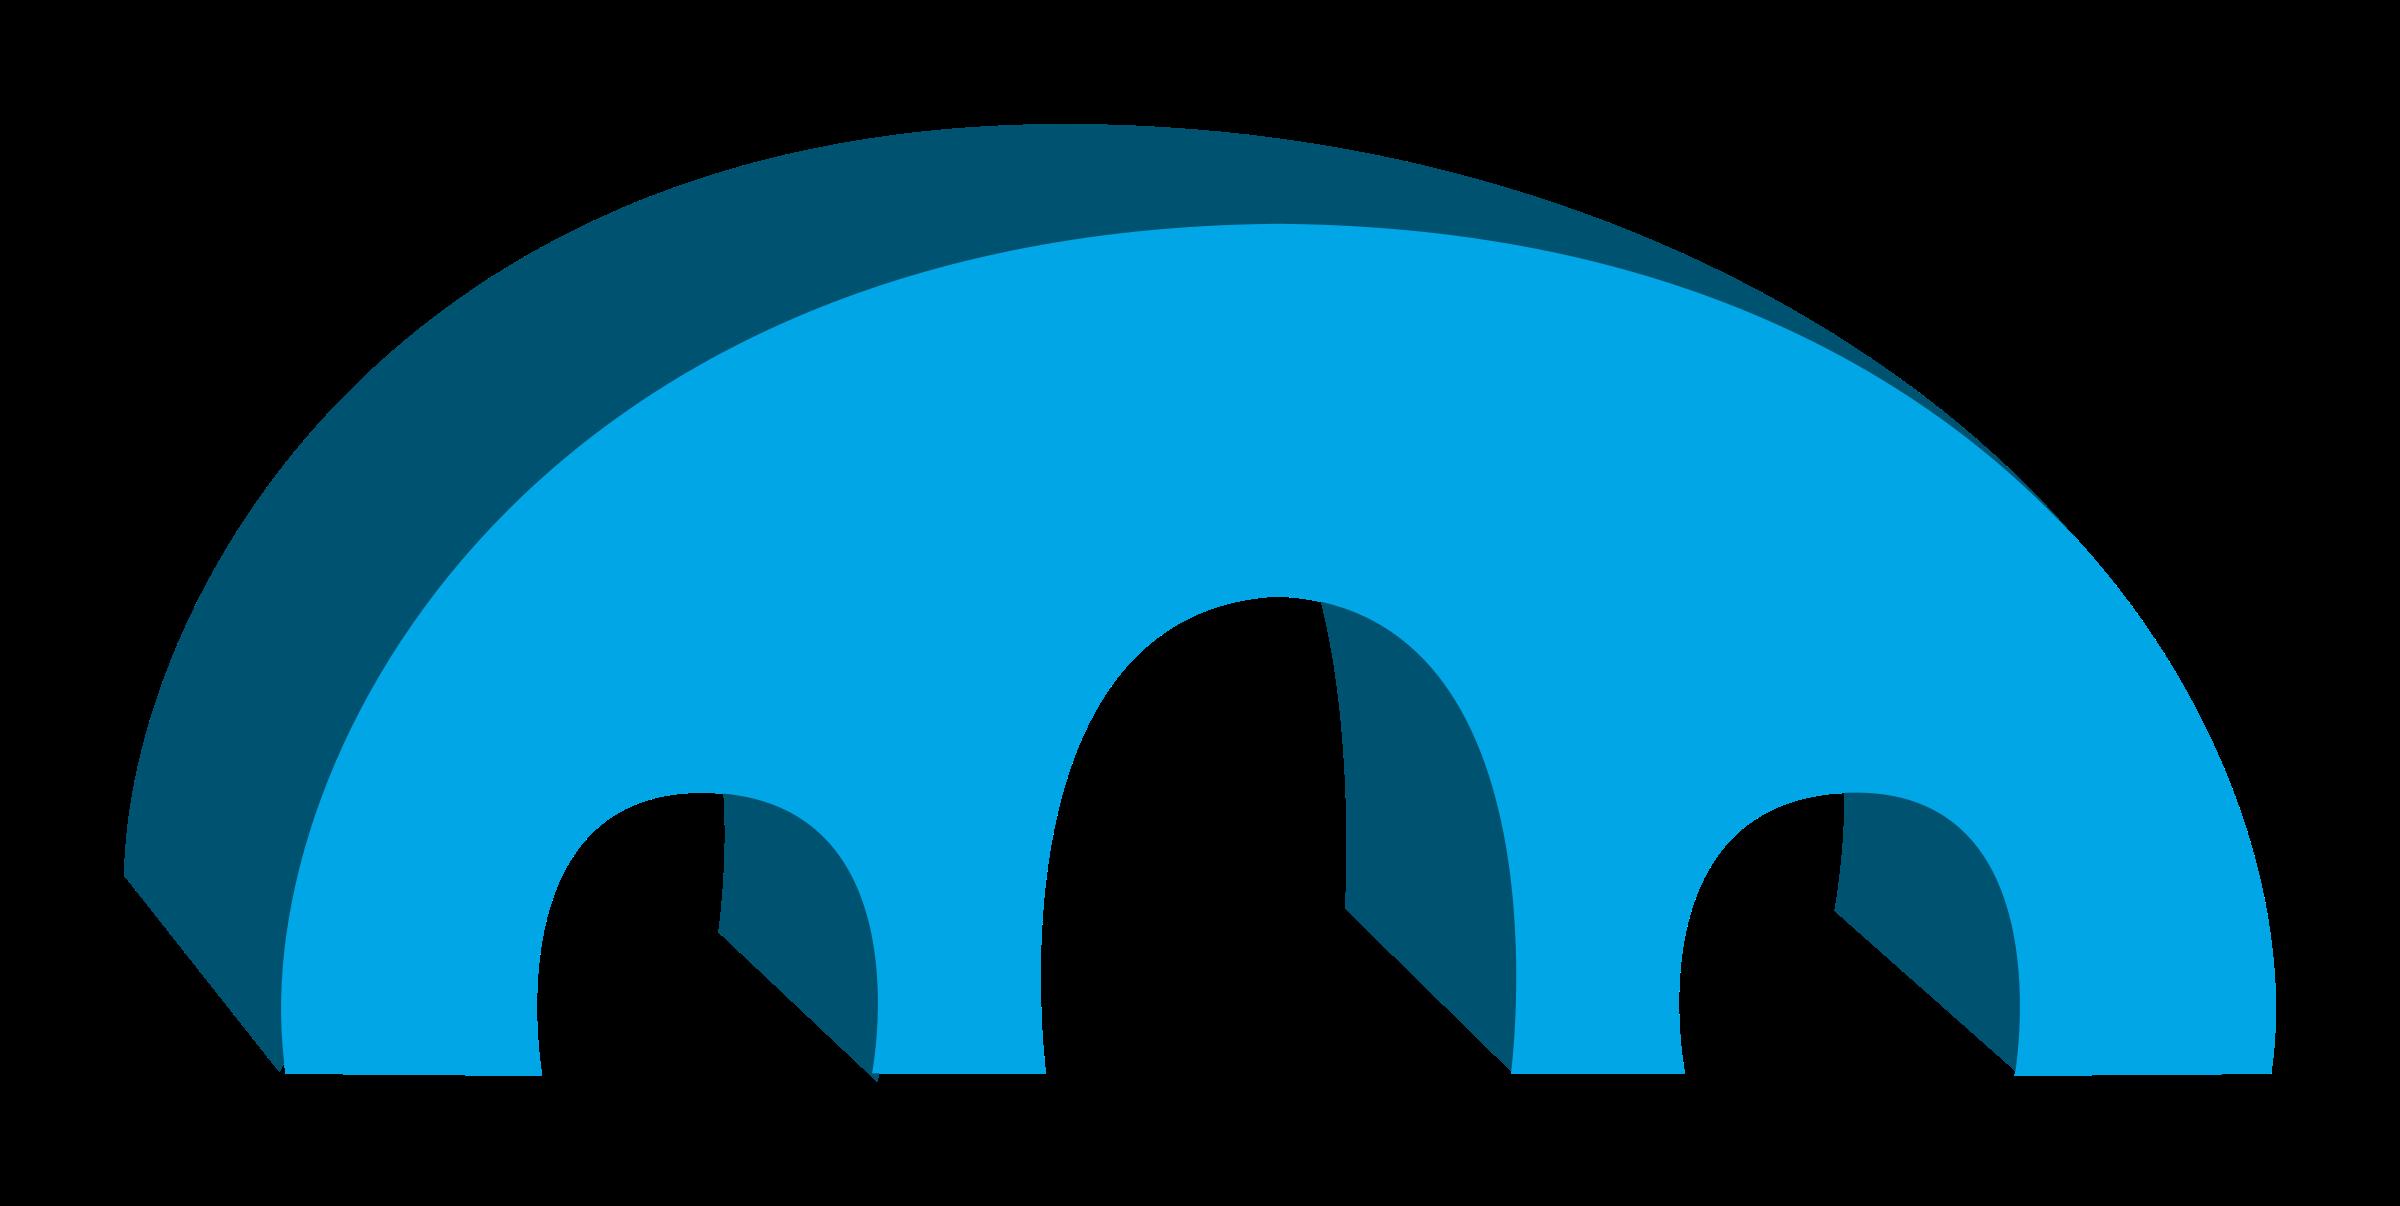 Logo clipart bridge. Simple d big image